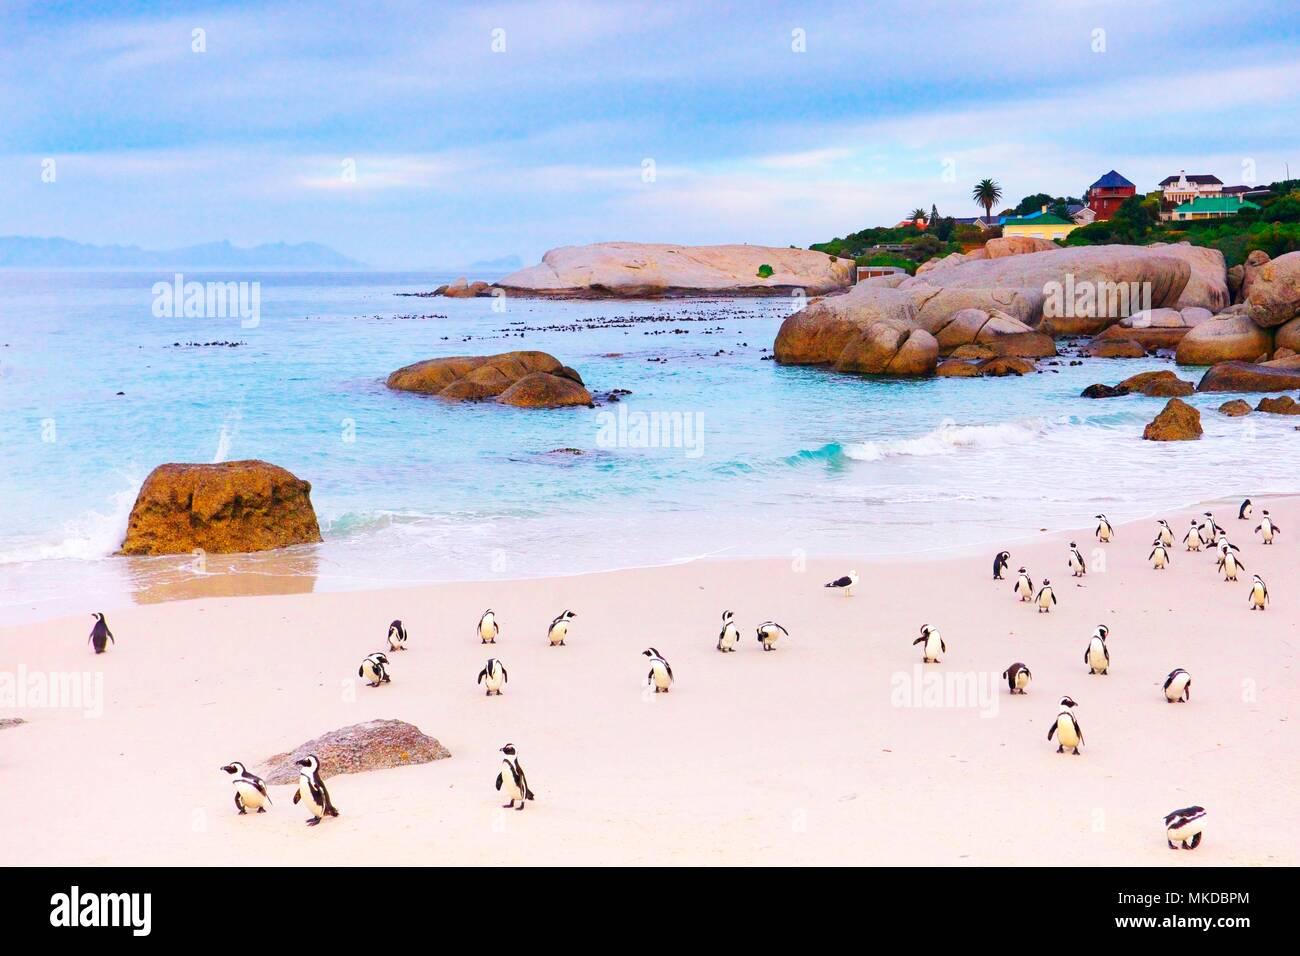 Jackass penguins (Spheniscus demersus) on a beach, Boulders Beach, South Africa - Stock Image